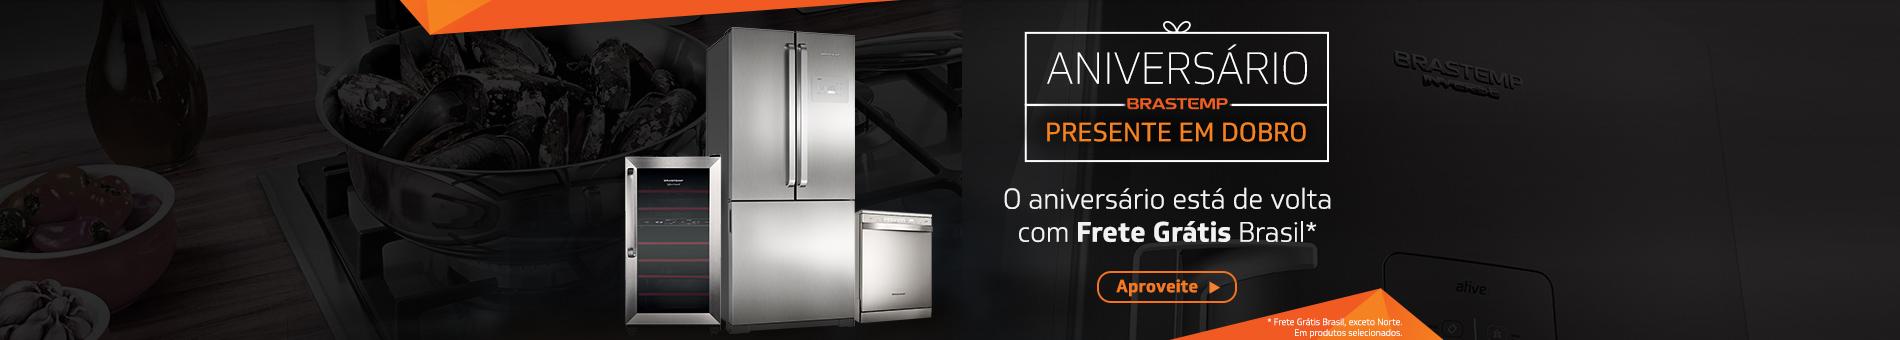 Promoção Interna - 751 - presenteemdobro_generico_home1_22082016 - generico - 1